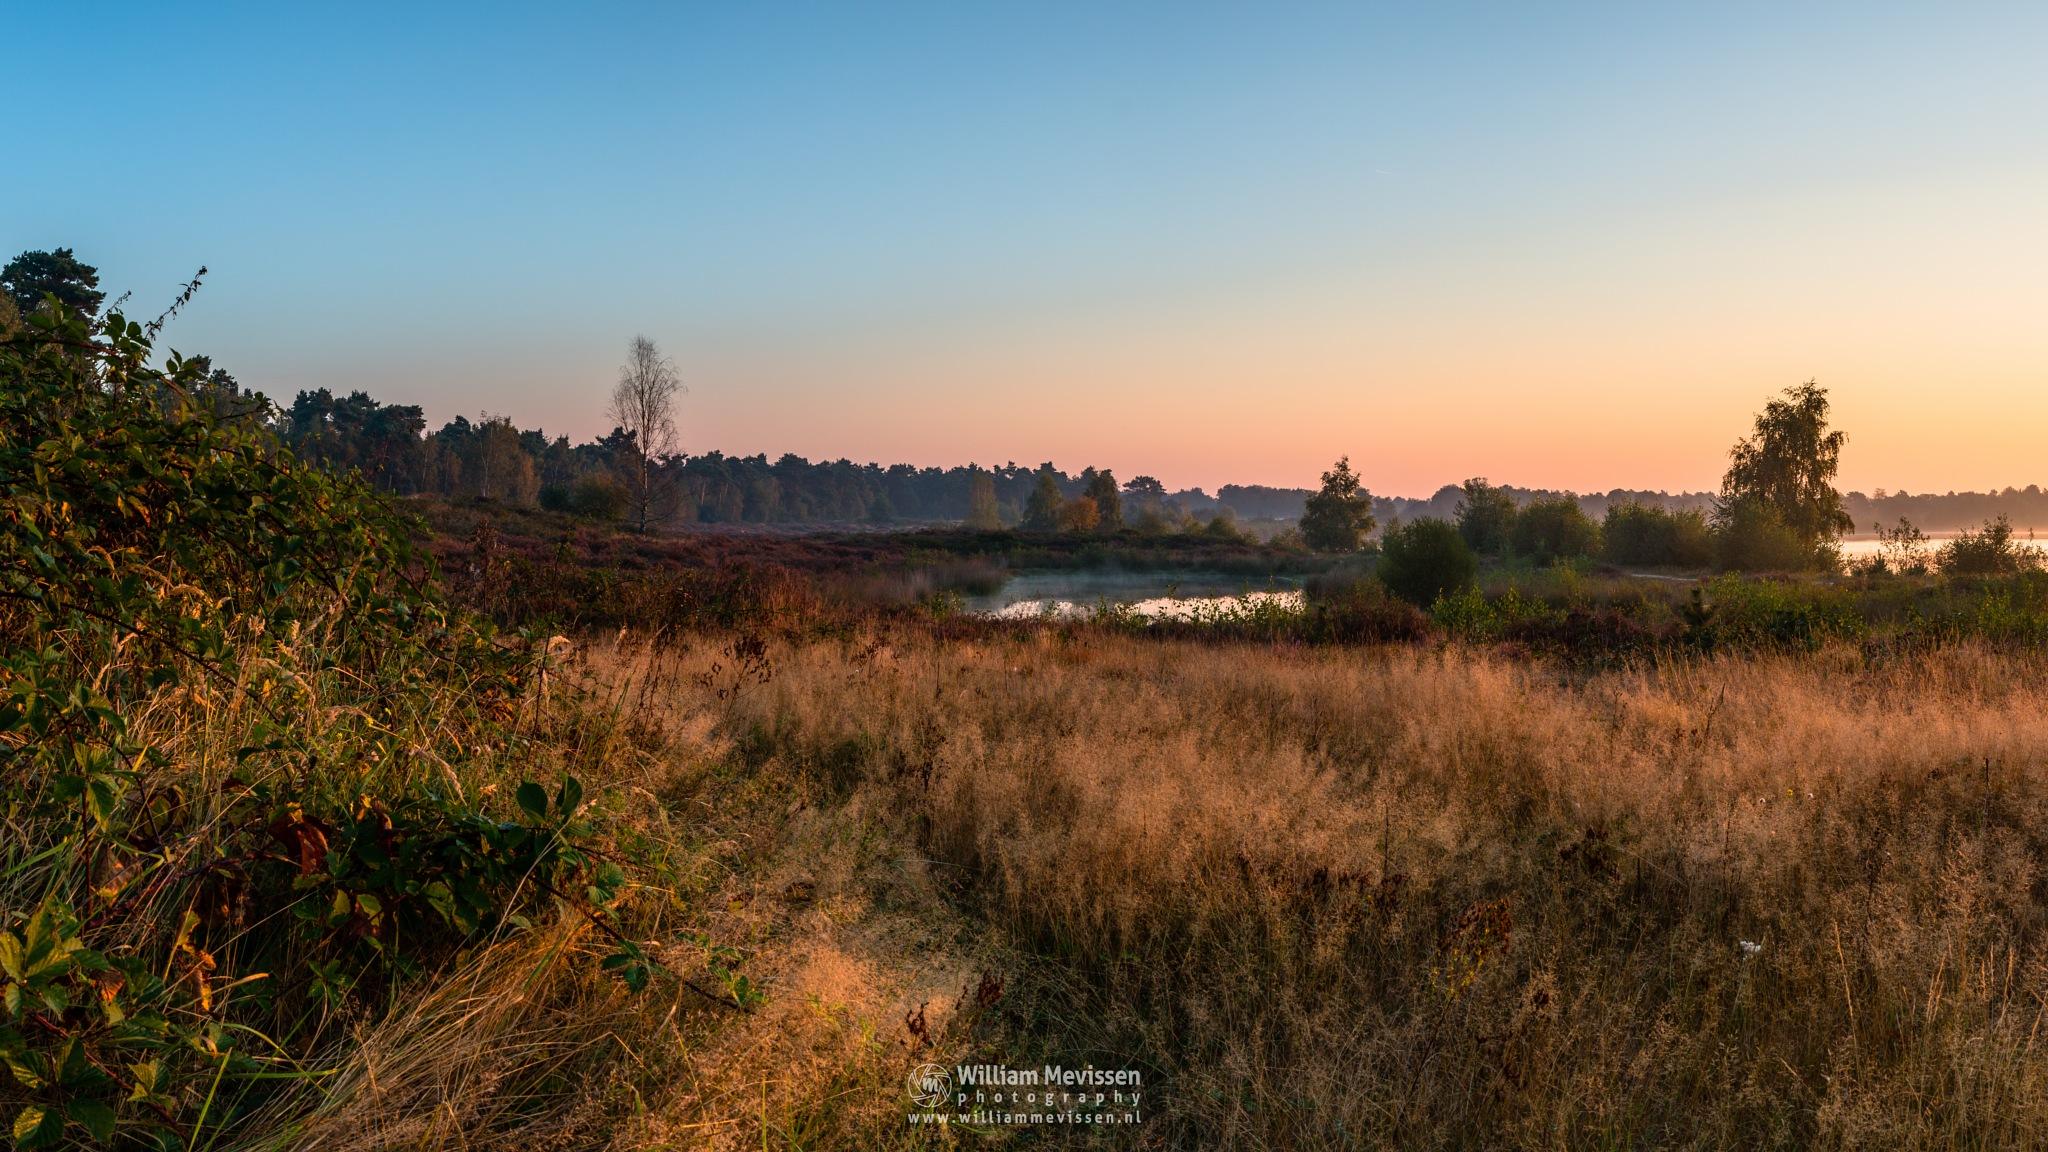 Panorama - Around The Lake by William Mevissen